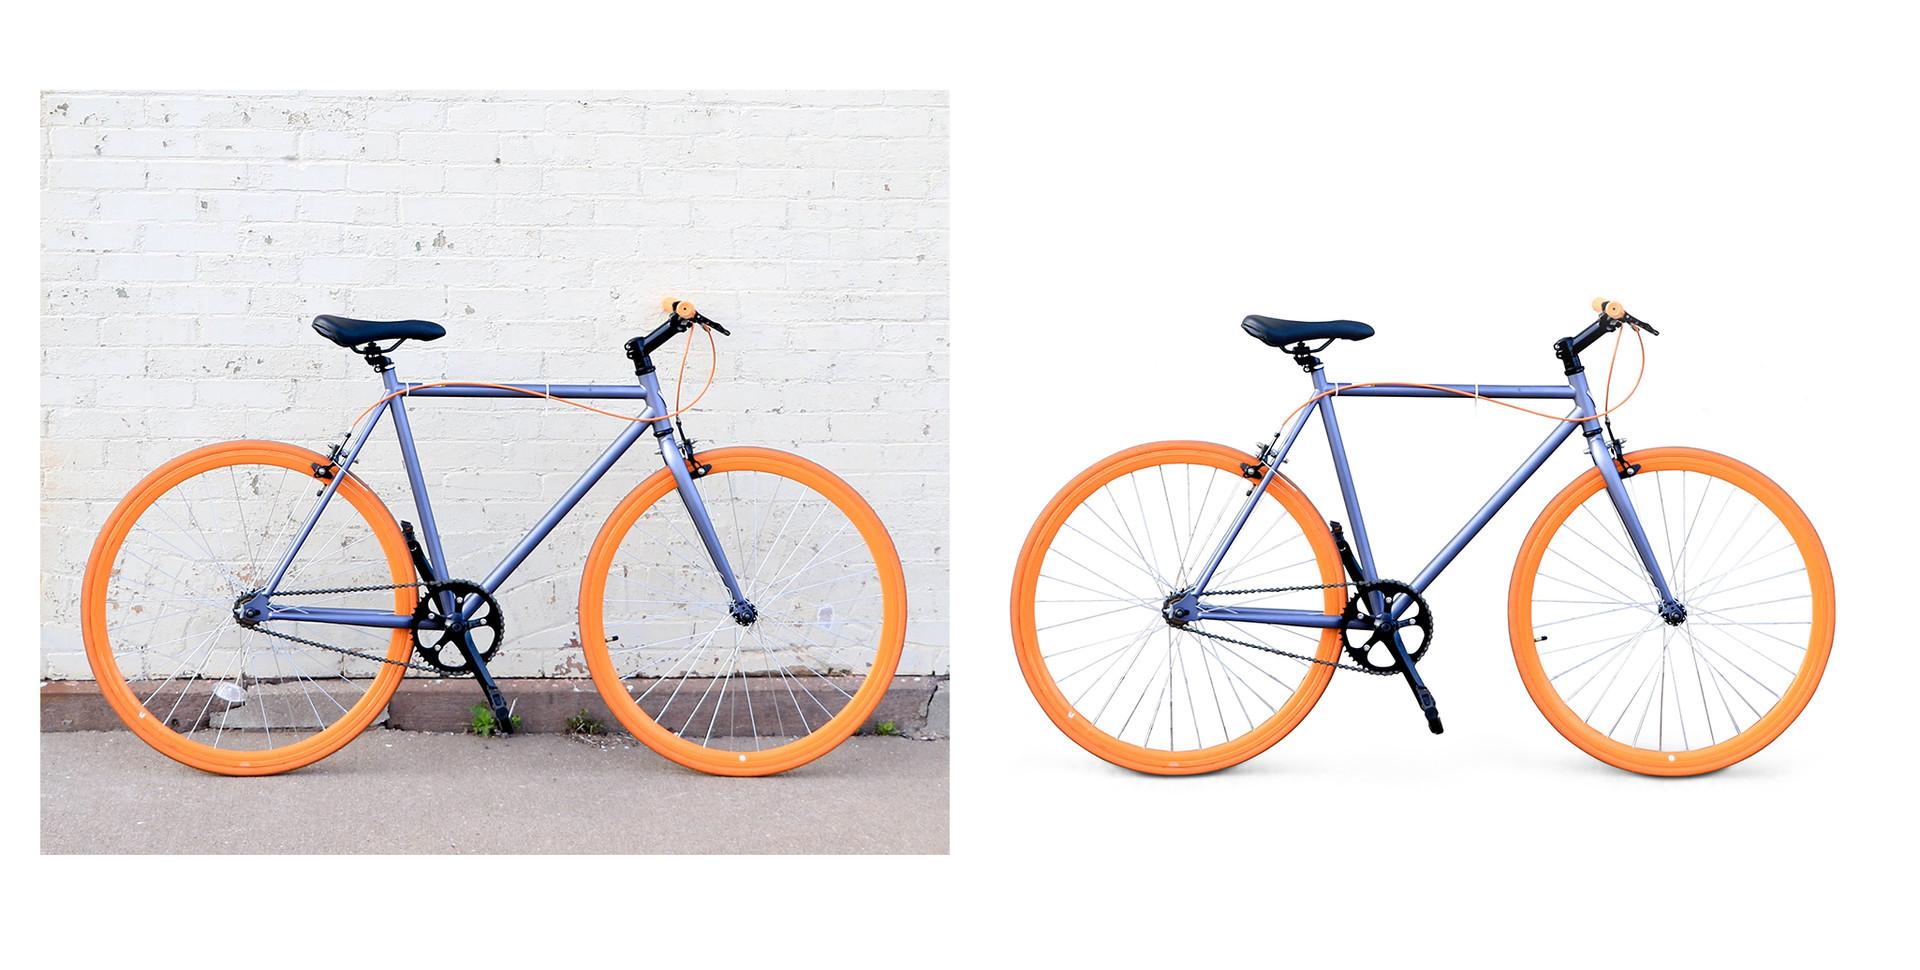 Bike_example.jpg